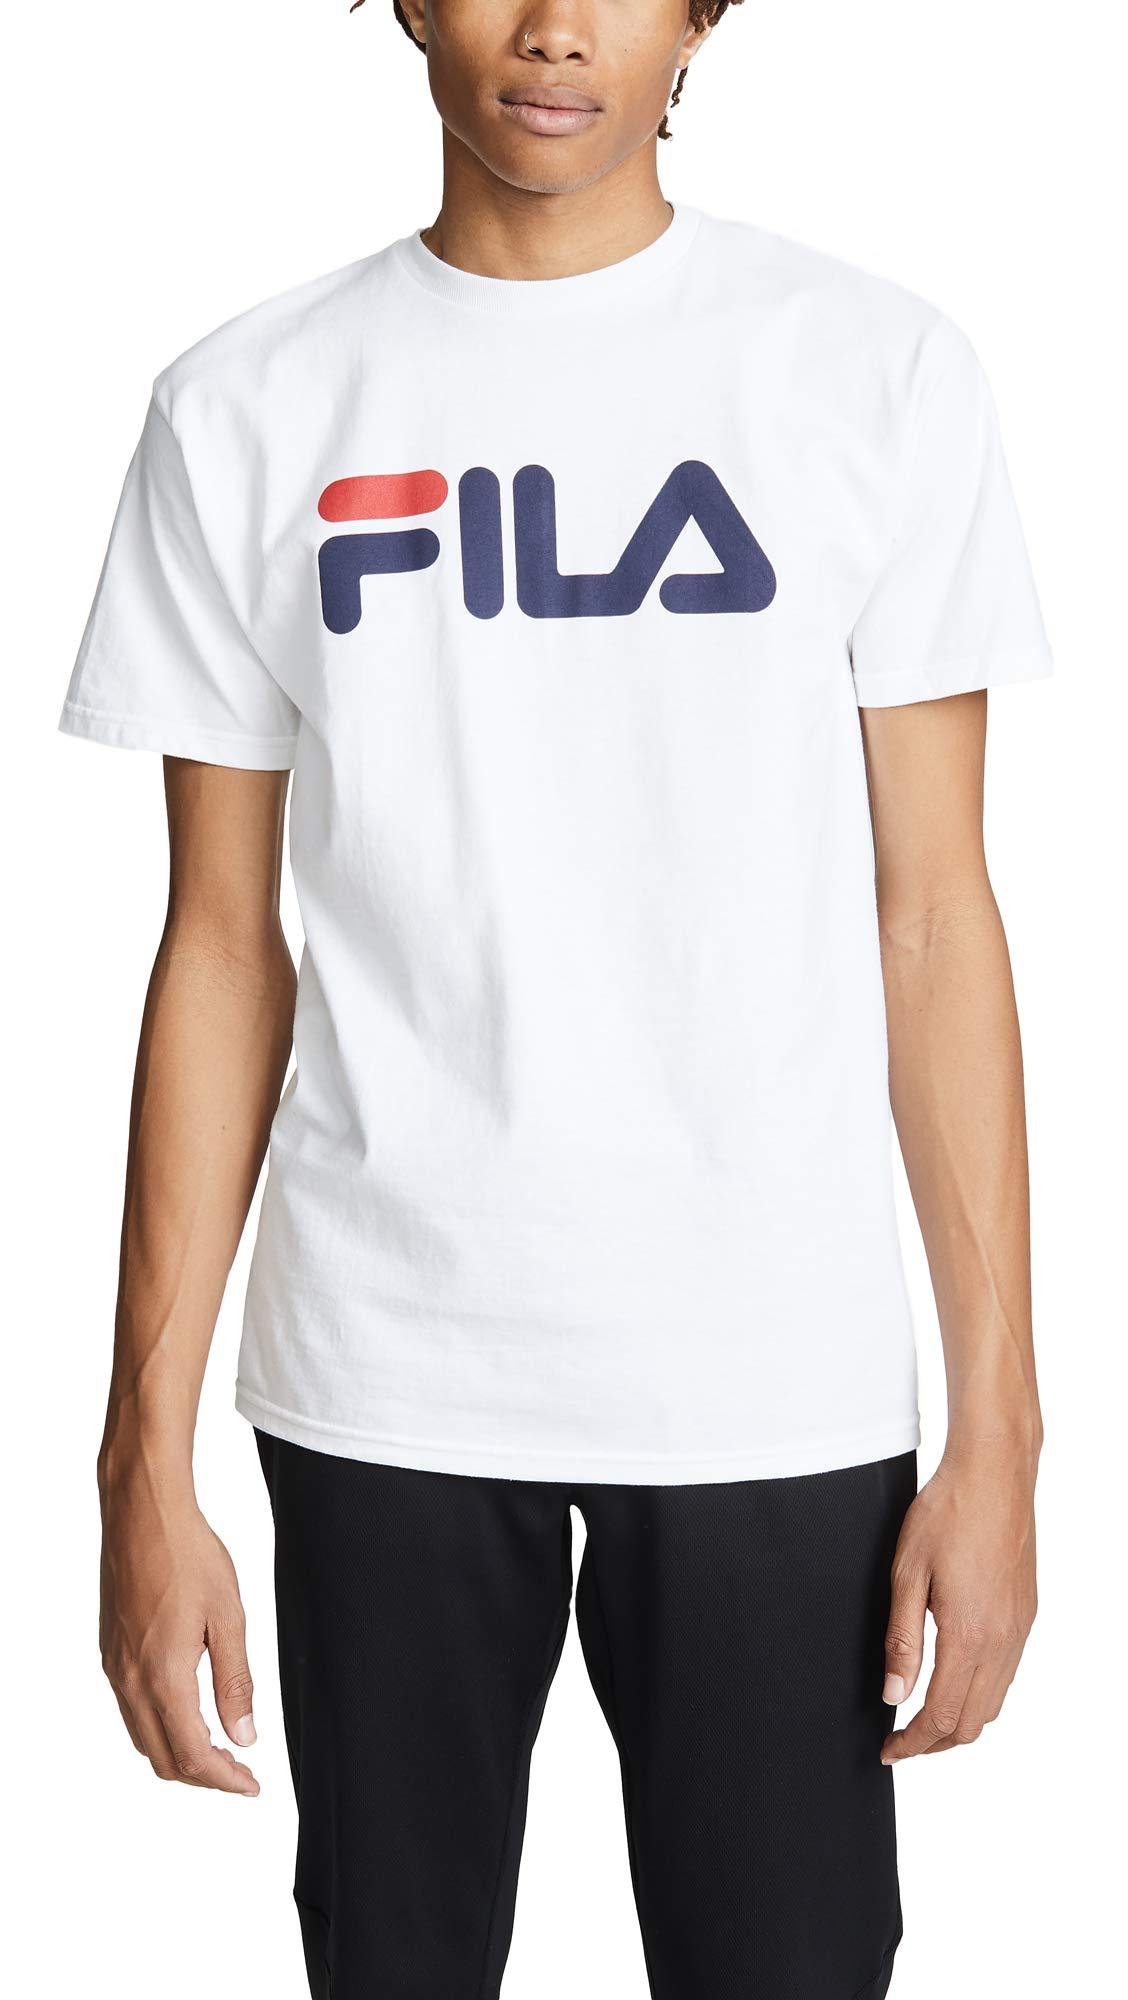 Fila Men's Printed Tee, White, Small